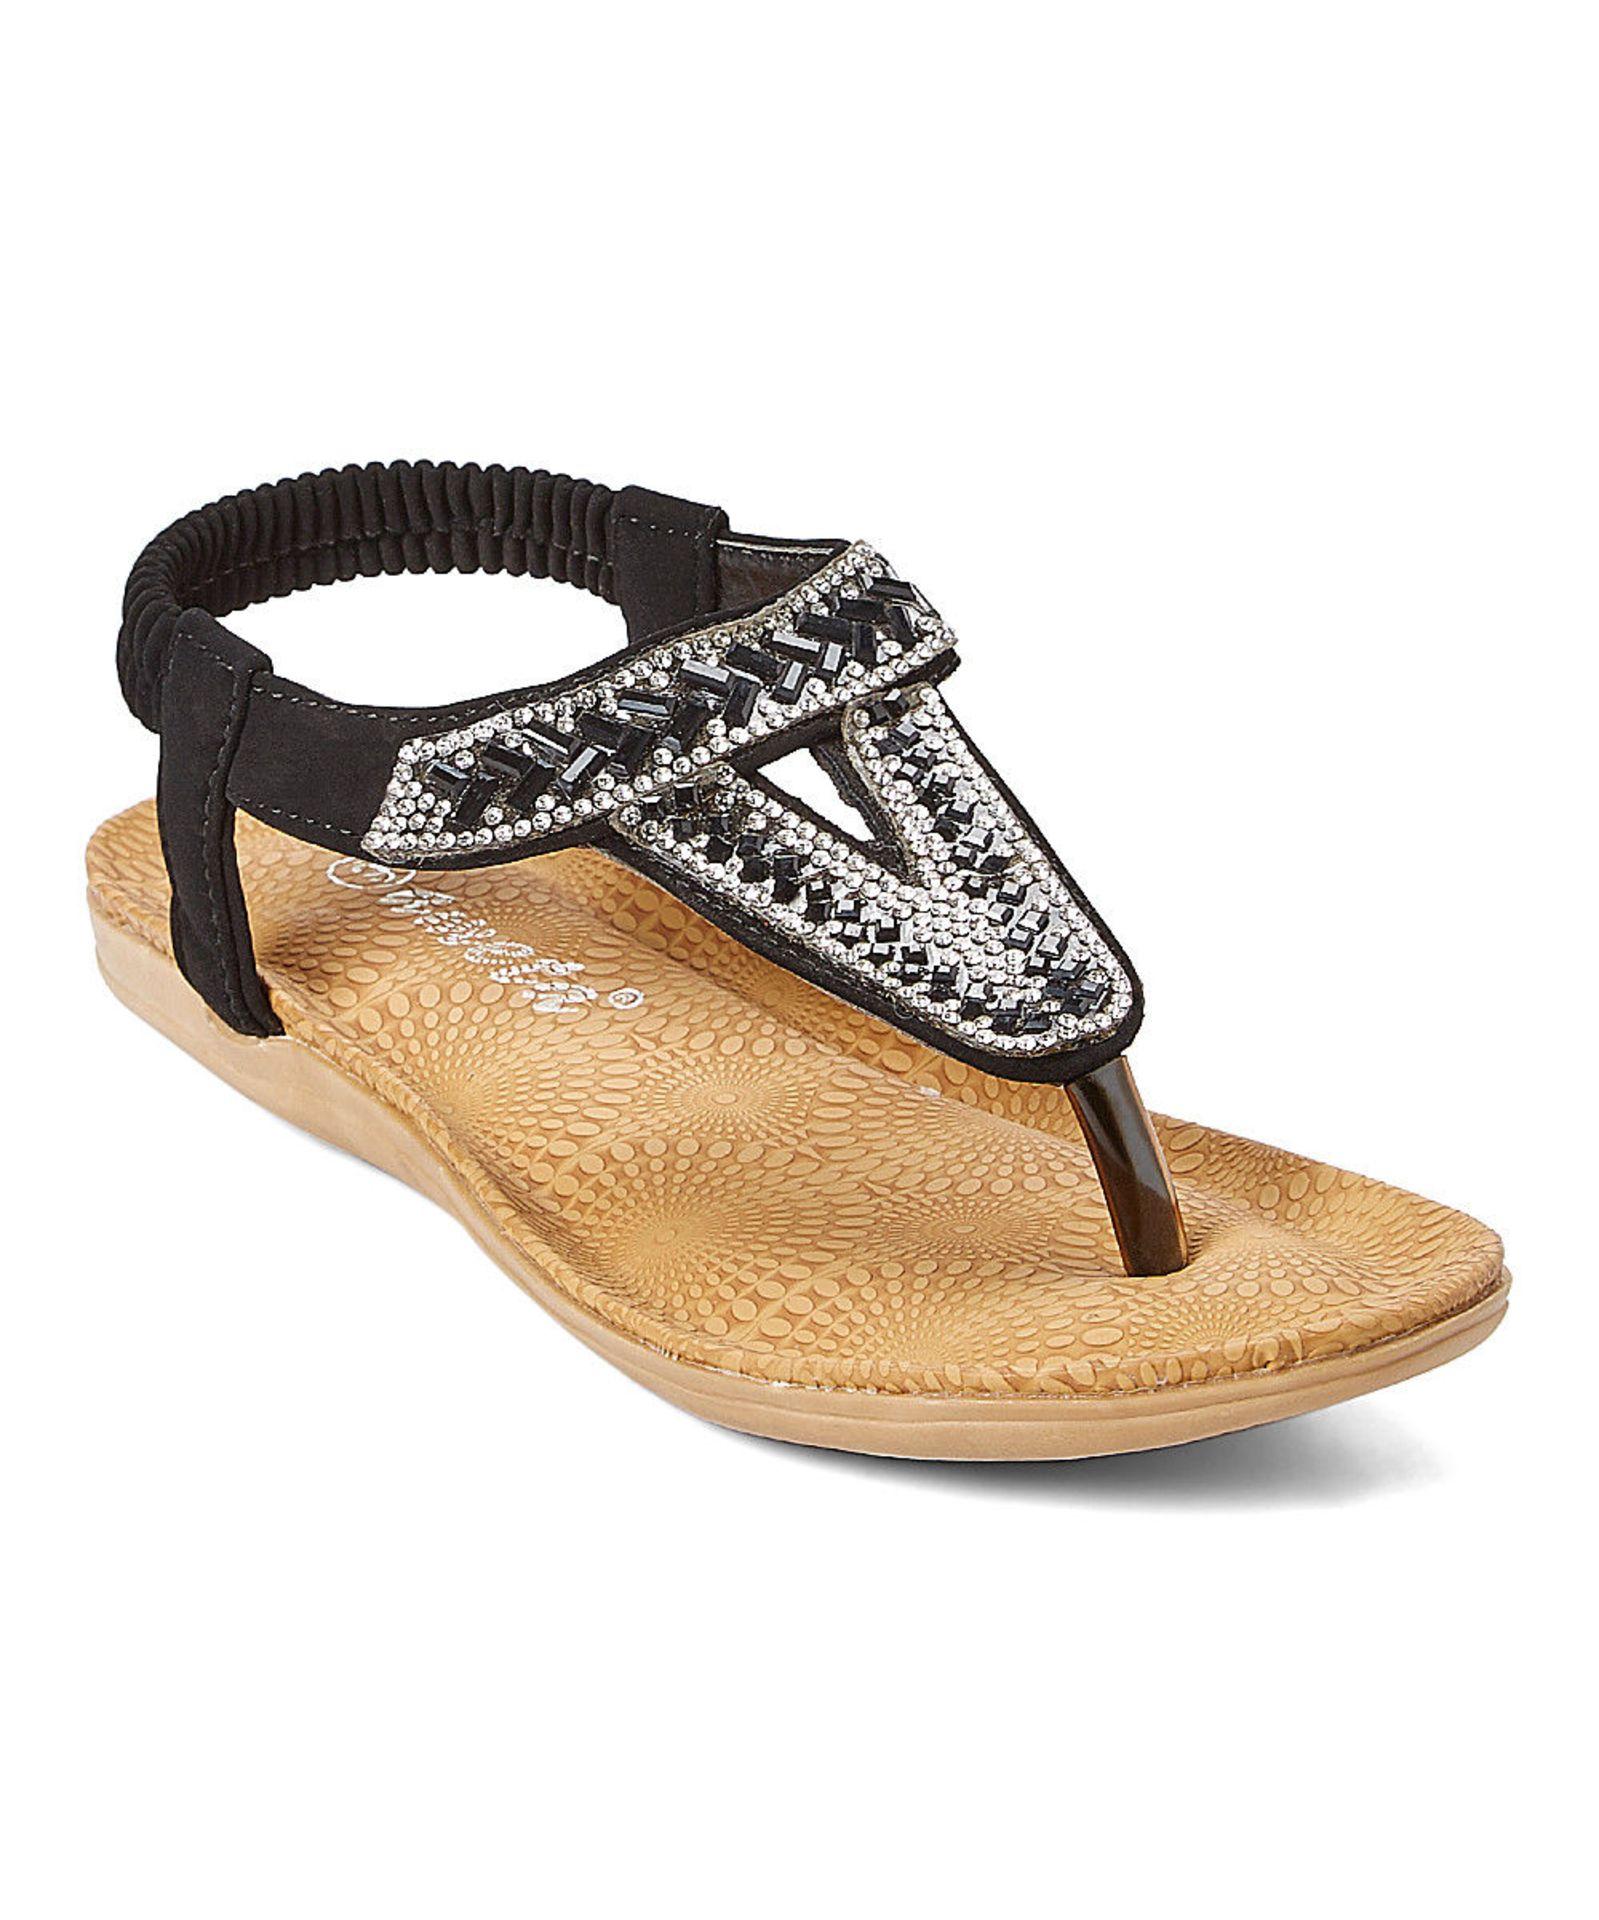 Lot 31 - Ameta Black Geometric Embellished T-Strap Sandal (Uk Size:6.5/Us Size:9) (New With Box) [Ref: